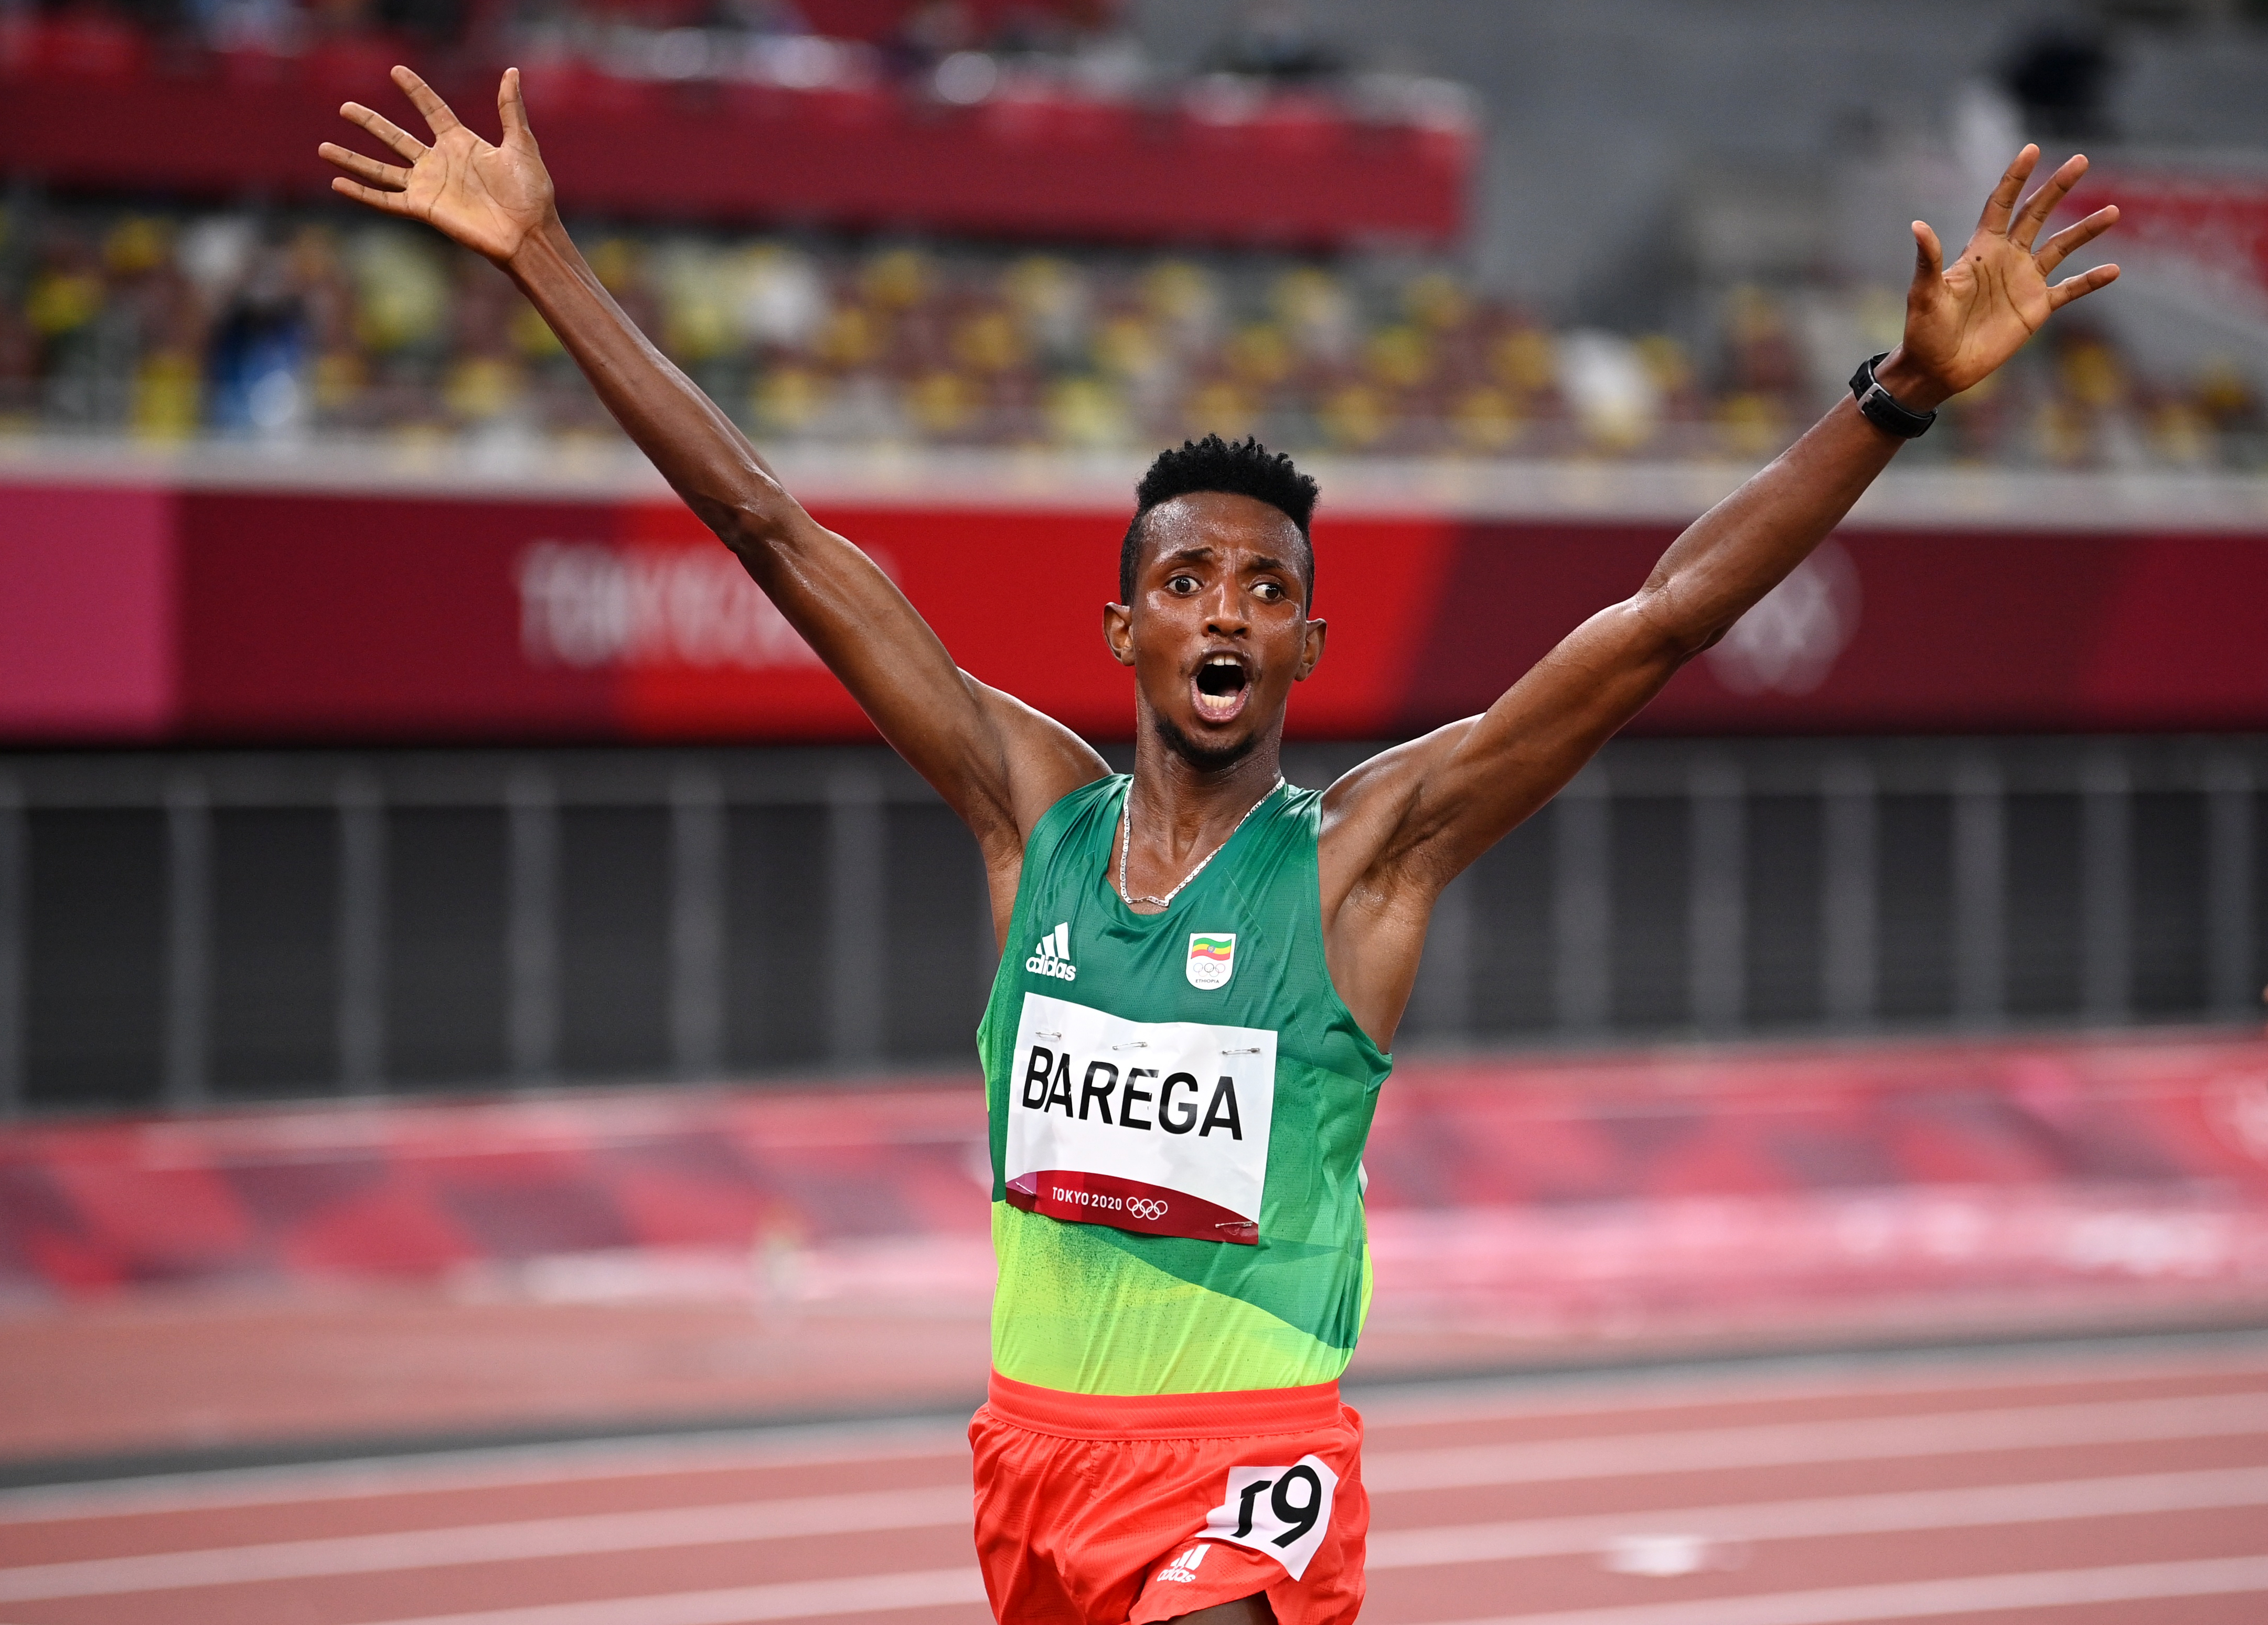 Tokyo 2020 Olympics - Athletics - Men's 10000m - OLS - Olympic Stadium, Tokyo, Japan - July 30, 2021. Selemon Barega of Ethiopia celebrates after winning gold REUTERS/Dylan Martinez